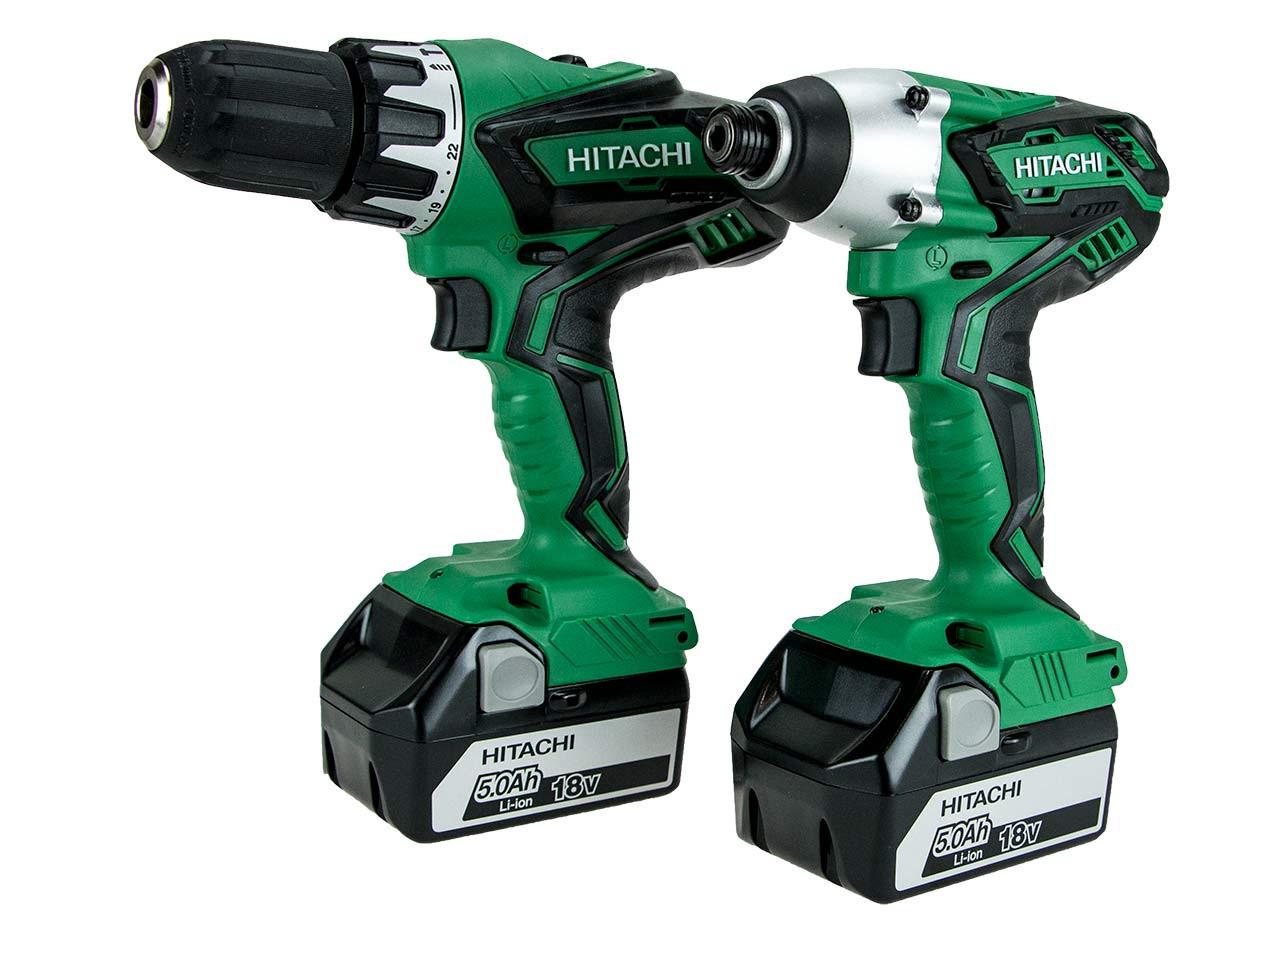 Hitachi Kc18dgl Je 18v Combi Drill Impact Driver Twin Kit With 2 X 5 0ah